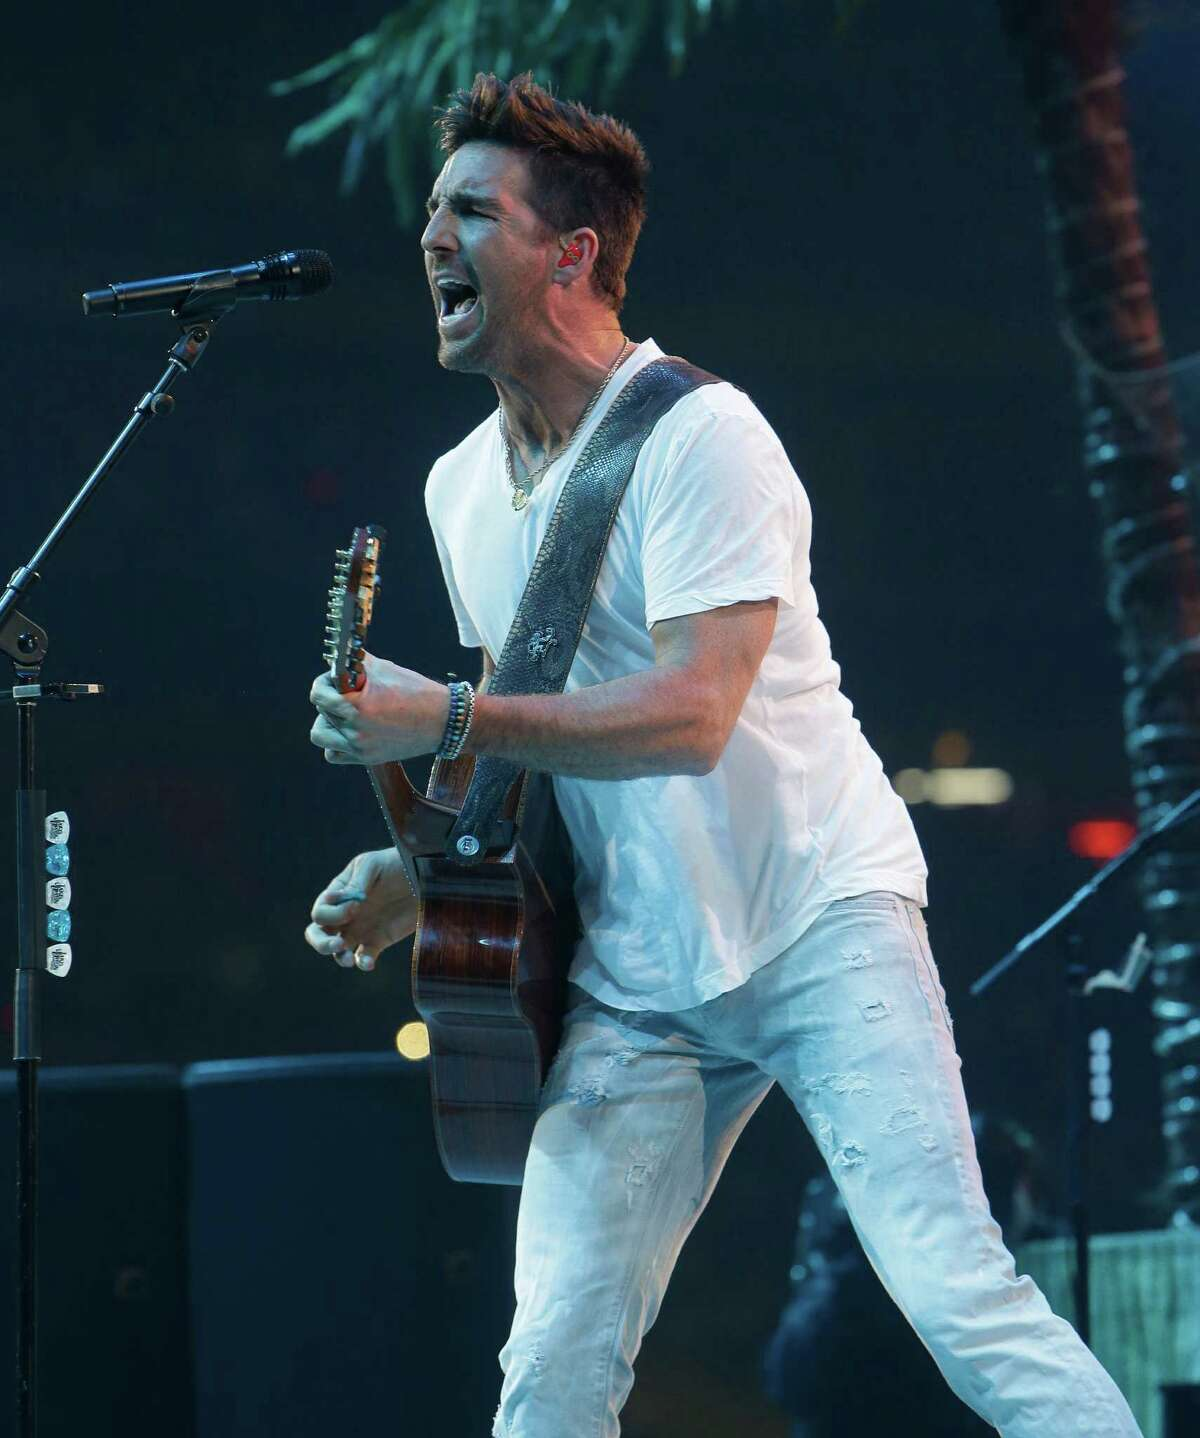 Jake Owen performs at RodeoHouston on Wednesday.